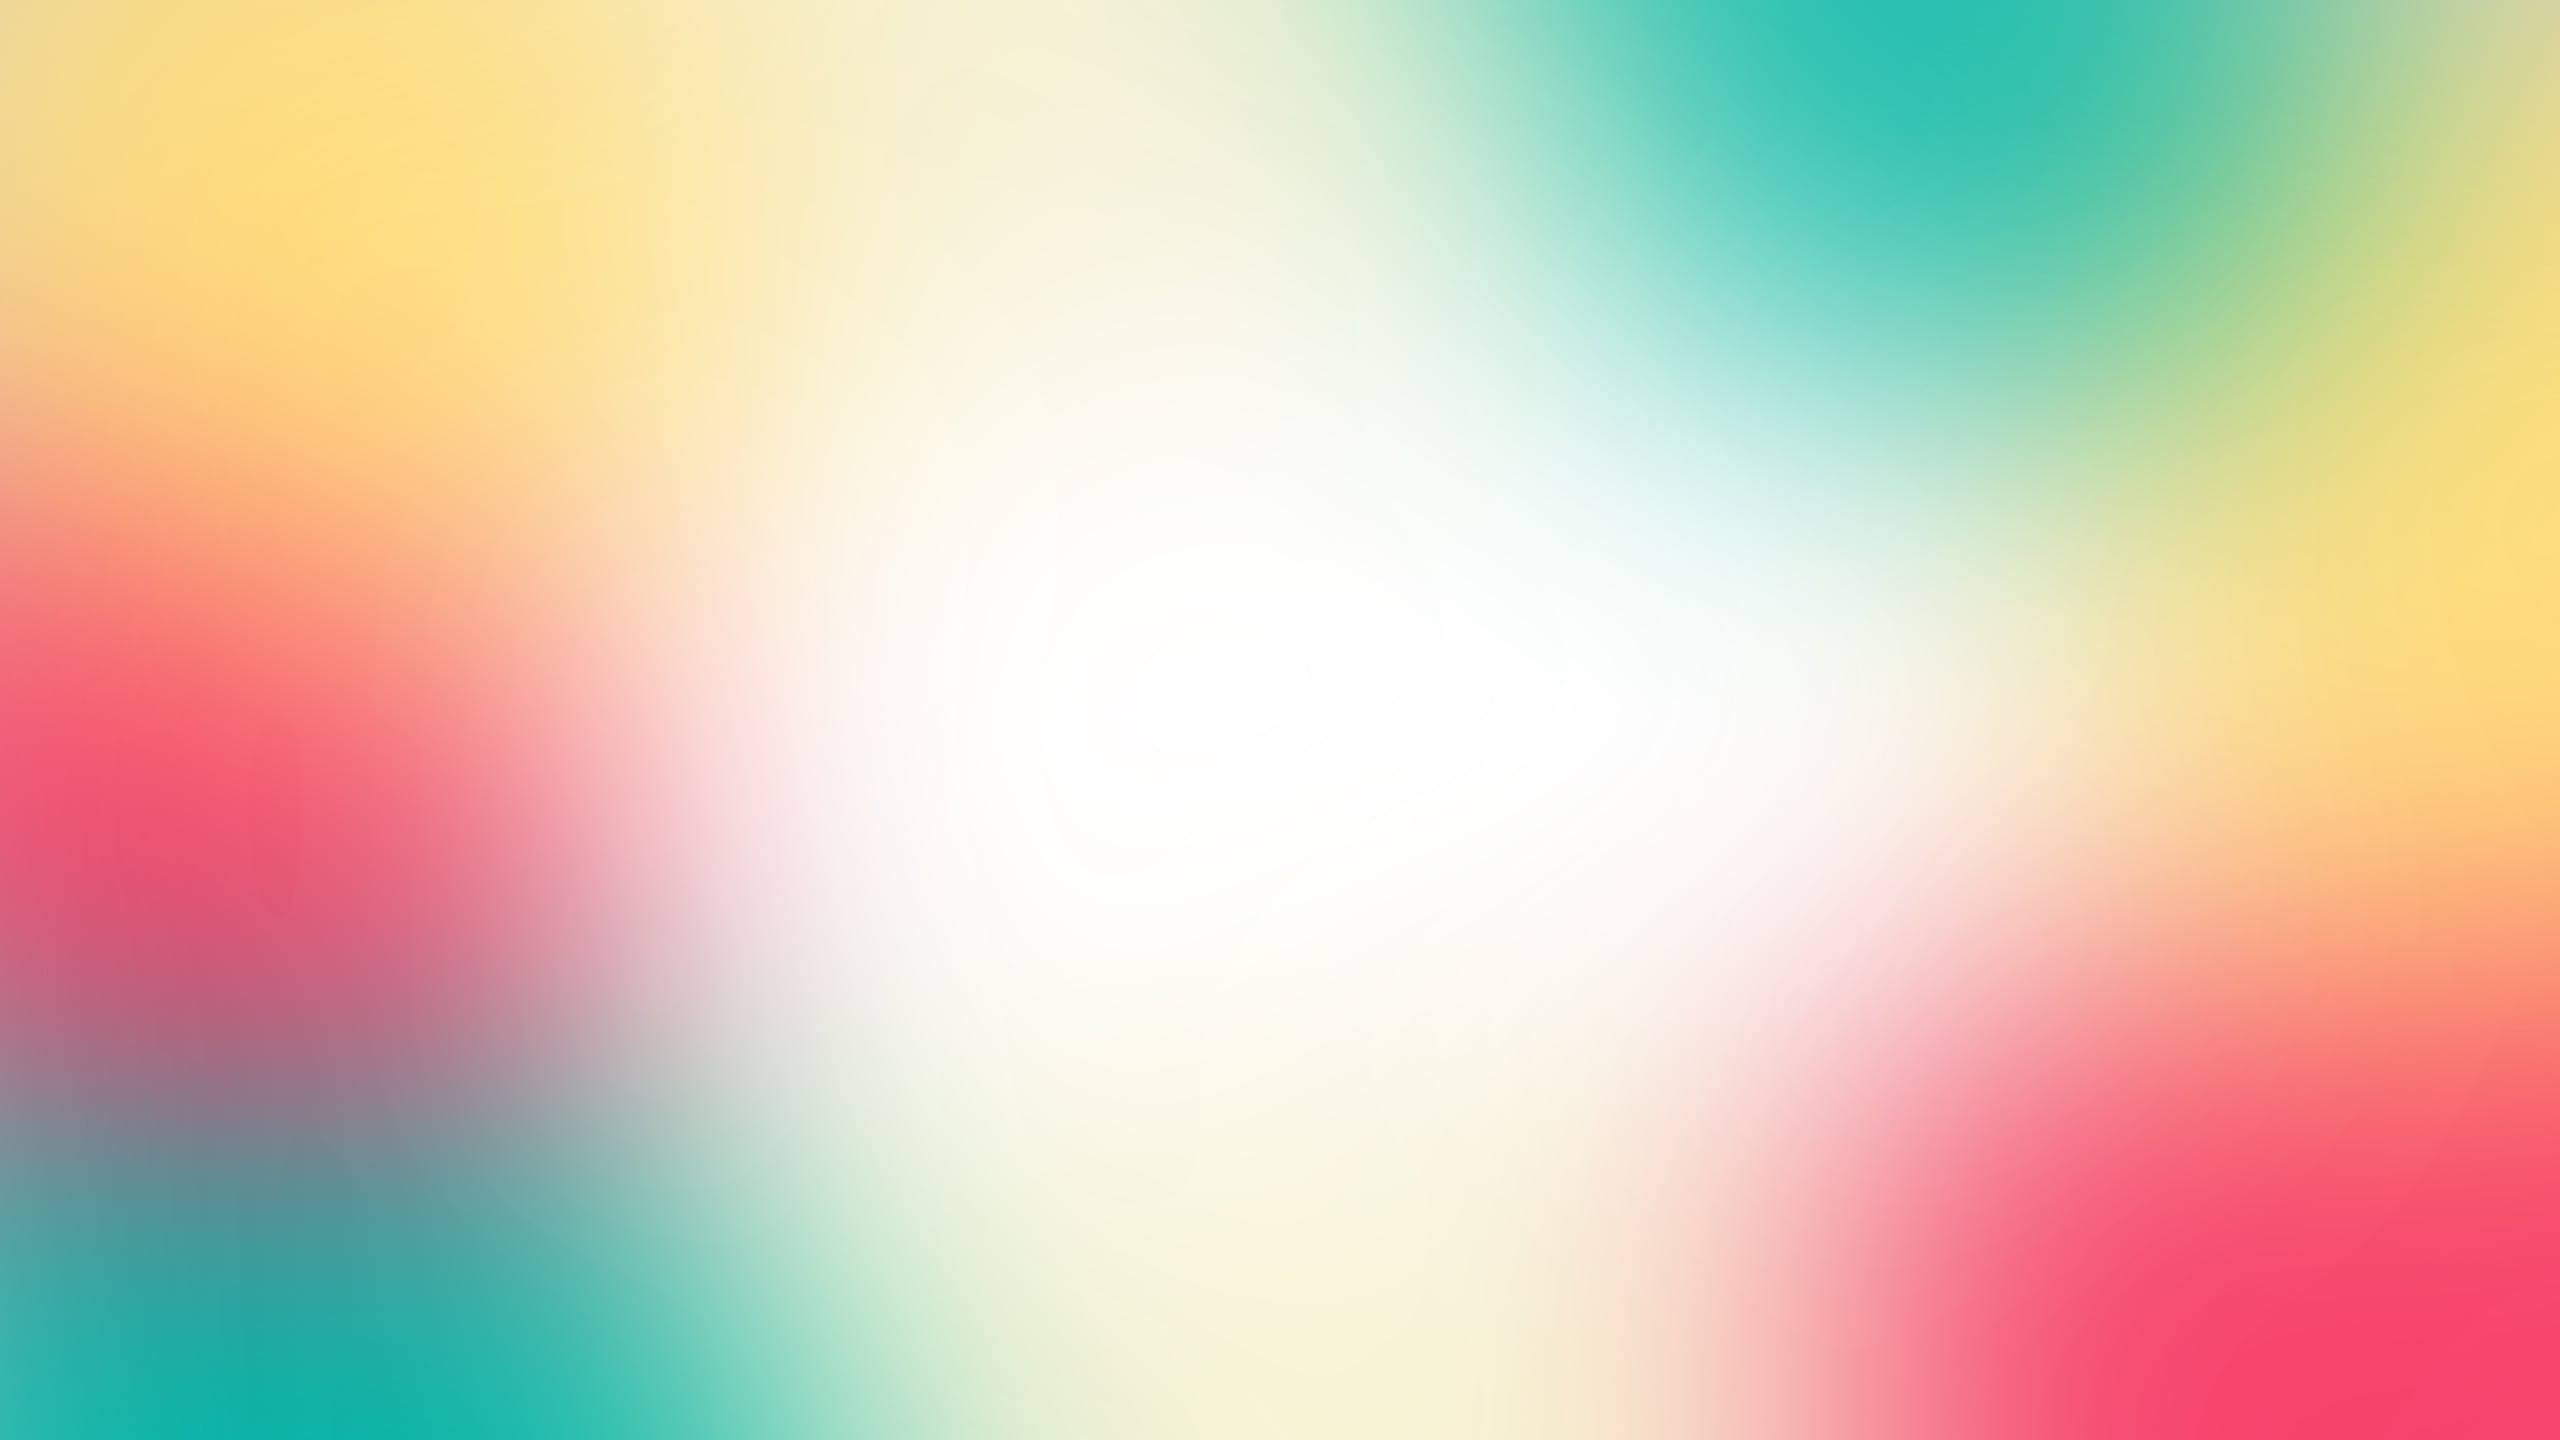 Simple Background Images Hd 2560x1440 Wallpaper Teahub Io